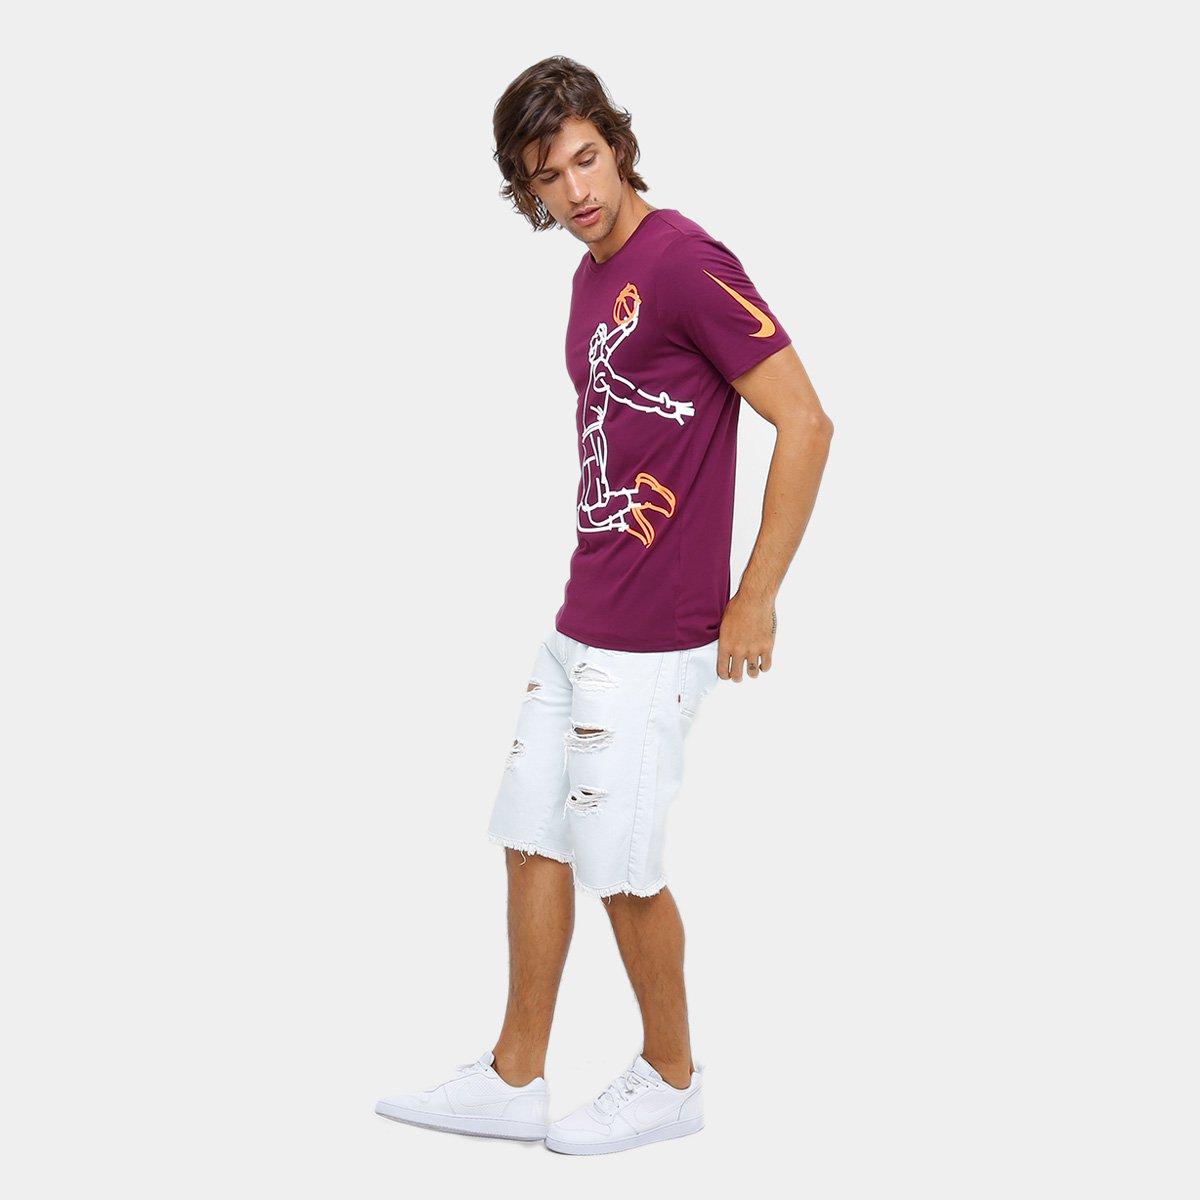 ff6778b417 Camiseta Lebron James Nike NBA Famous Masculina - Bordô - Compre ...